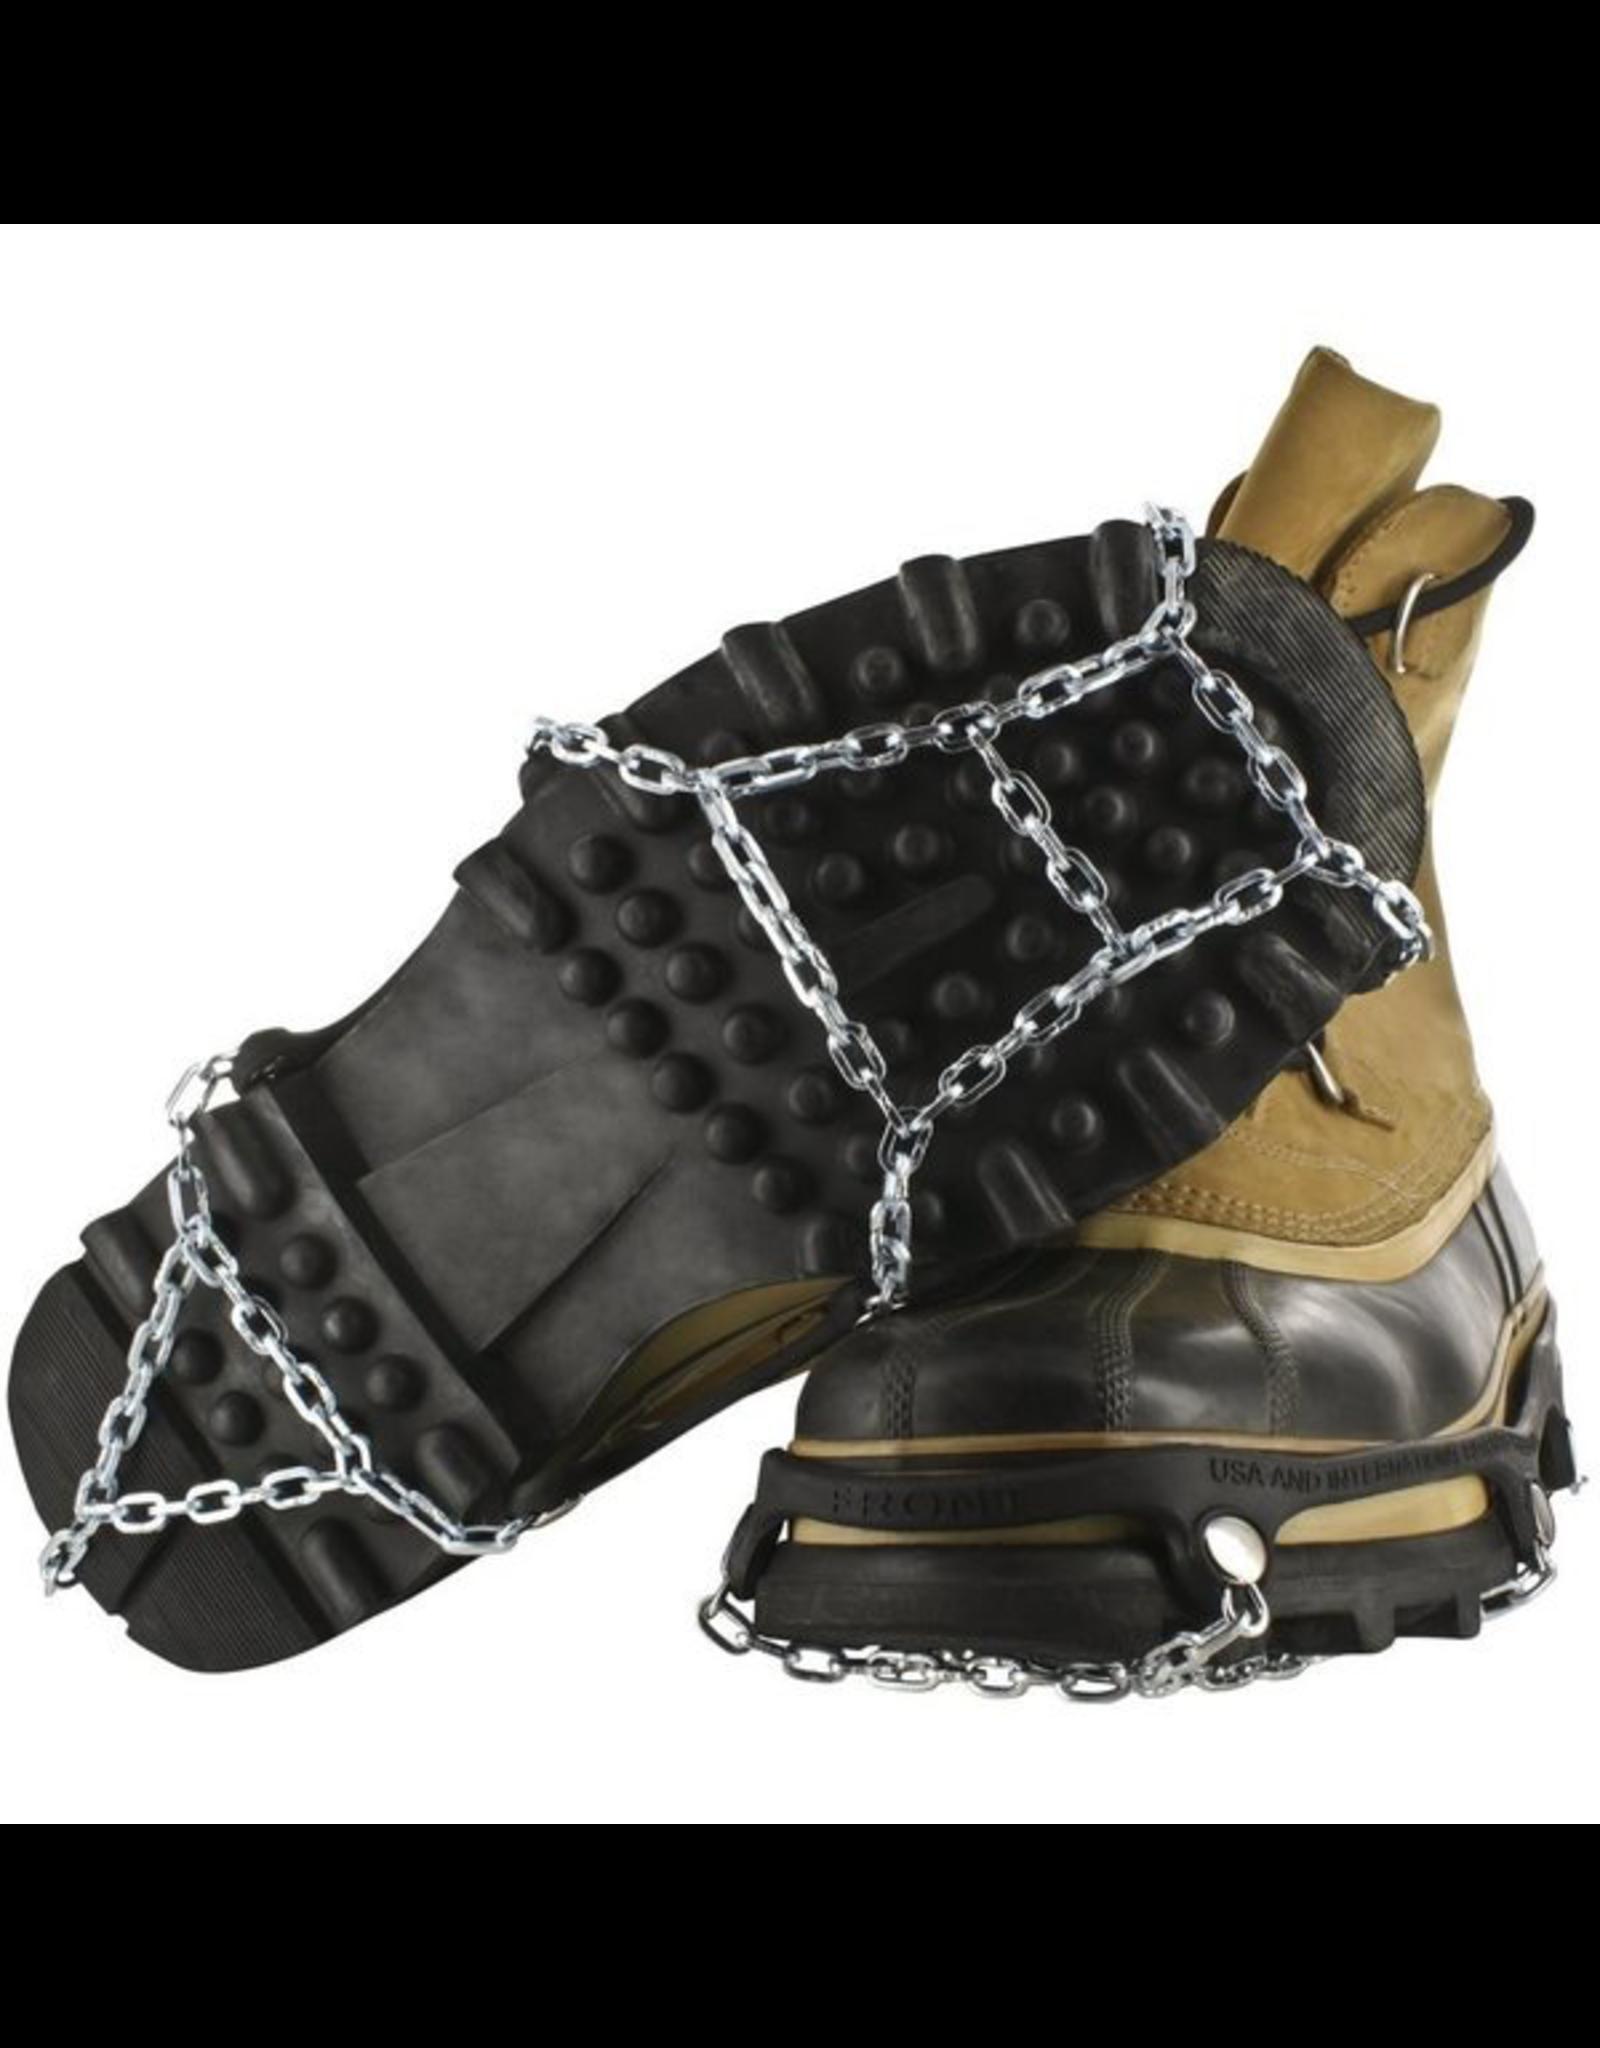 YakTrax YakTrax IceTrekkers Chains, Size L